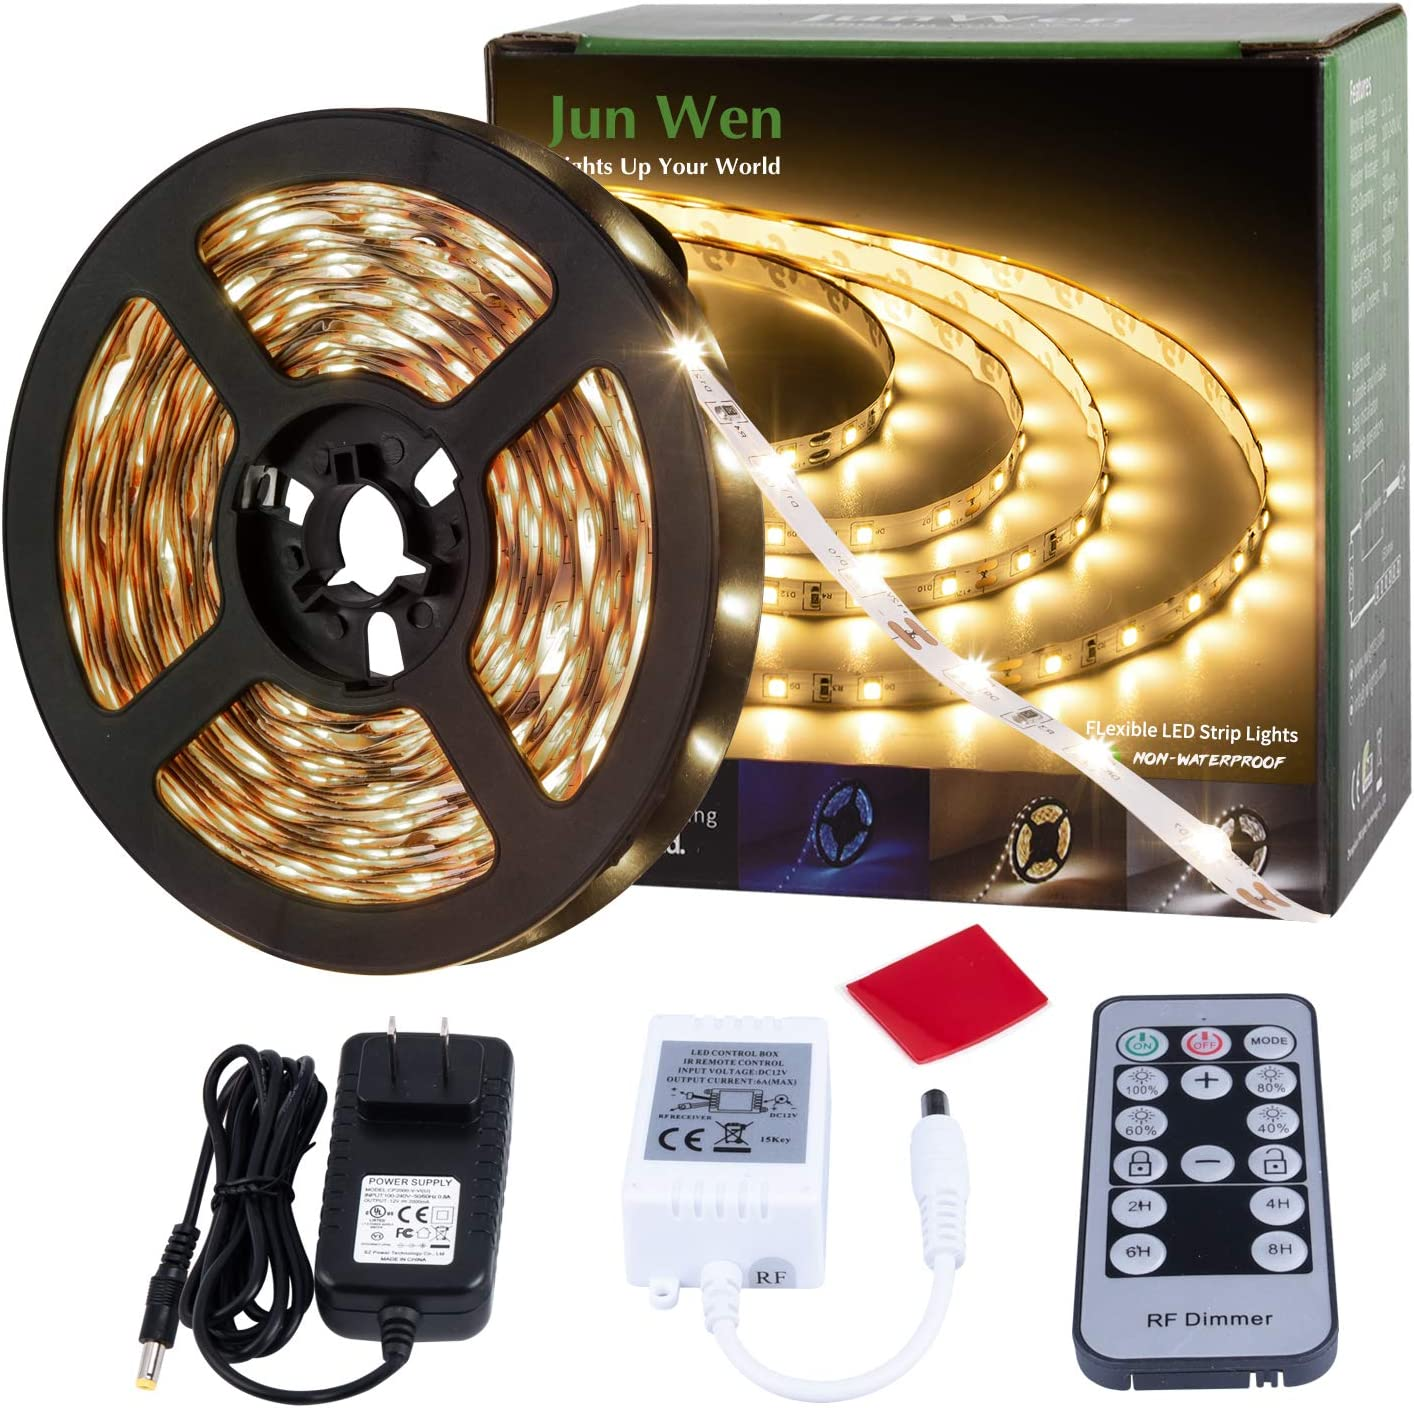 JUNWEN Warm White LED Strip Lights Dimmable Rope Lights RF Remote Under Cabinet Tape Lighting 300LEDs 16.4FT 12V FlexibleBacklight with 2A UL Power Supply for Bedroom, Kitchen